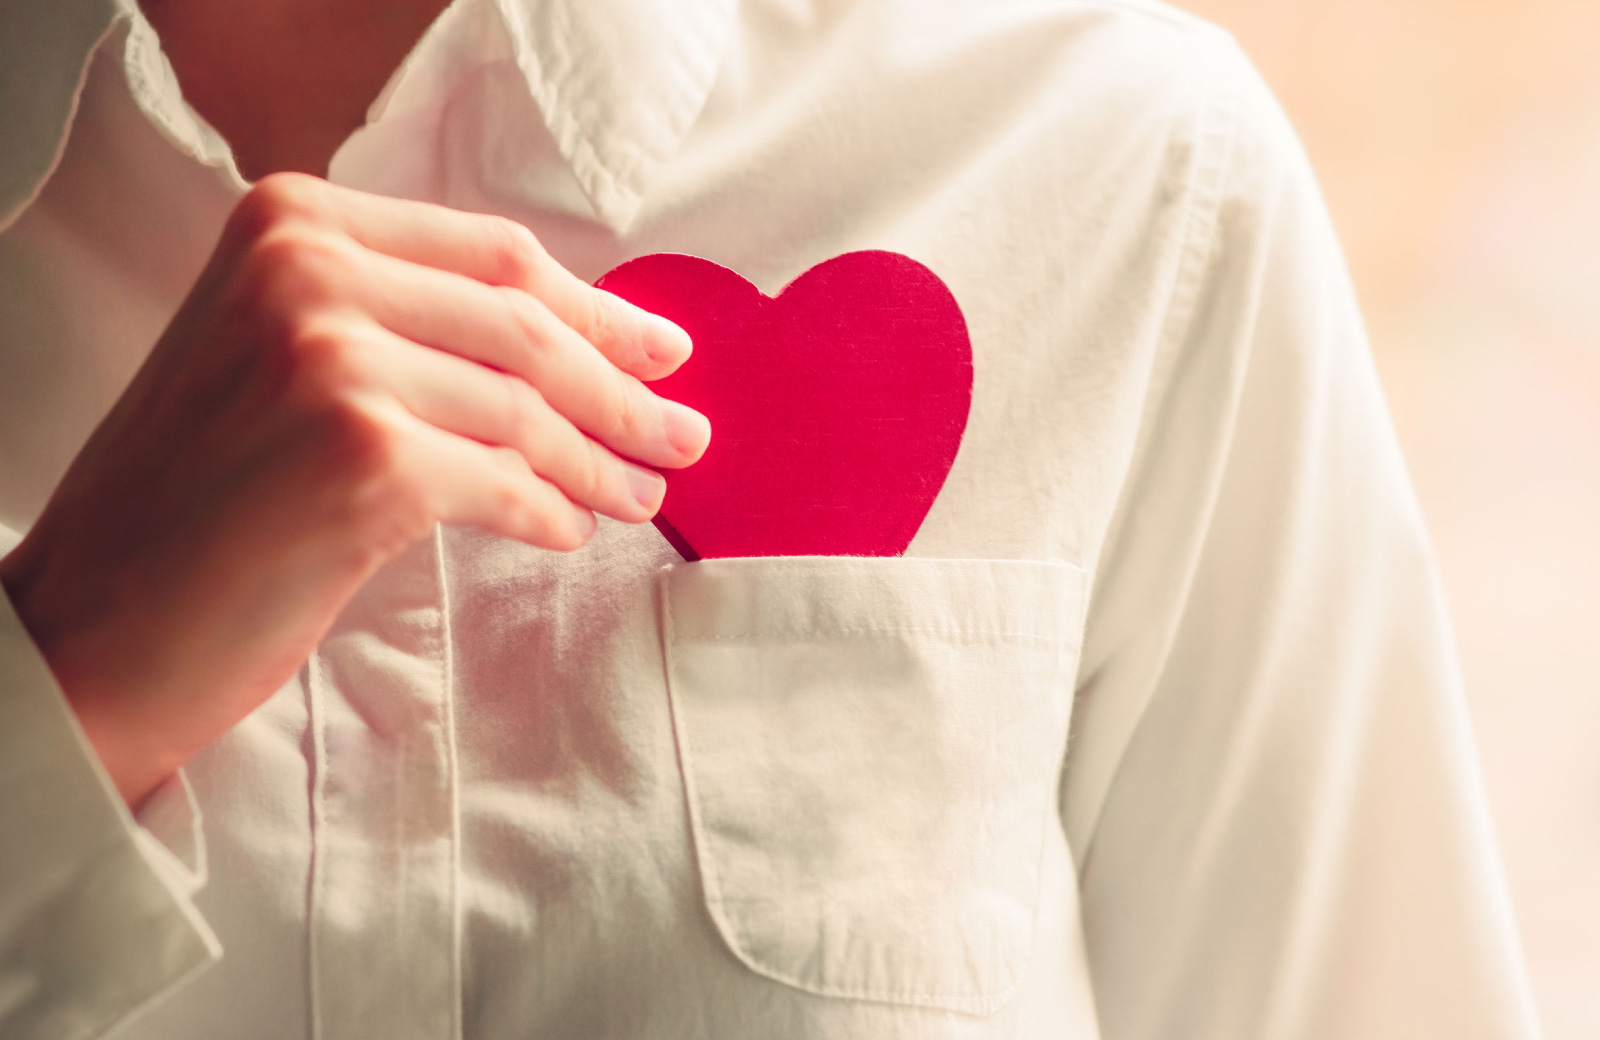 man putting a heart cut out in his shirt pocket west village davis